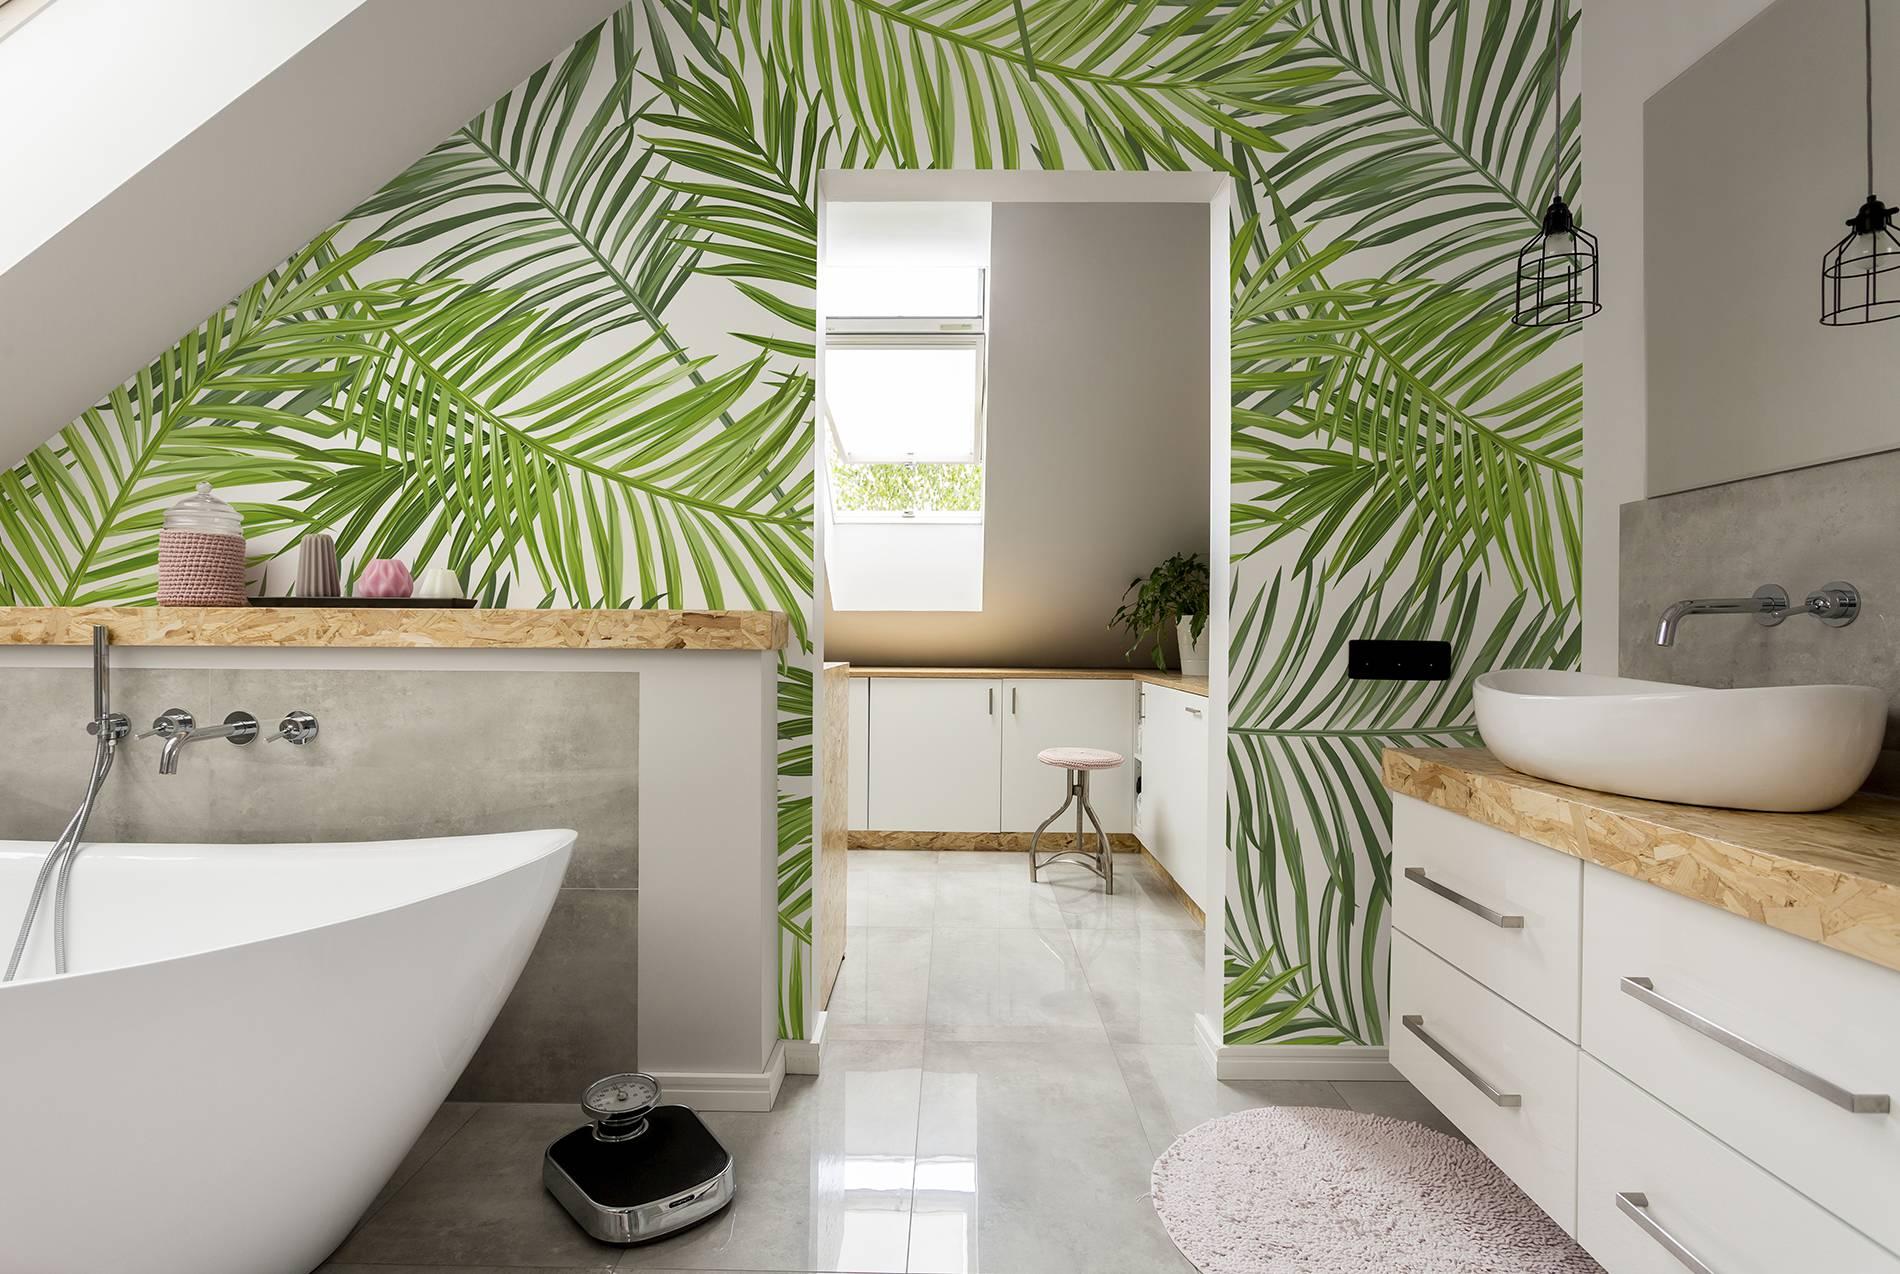 Manualidades y tendencias paredes espectaculares con pixers for Tendencias papel pintado 2017